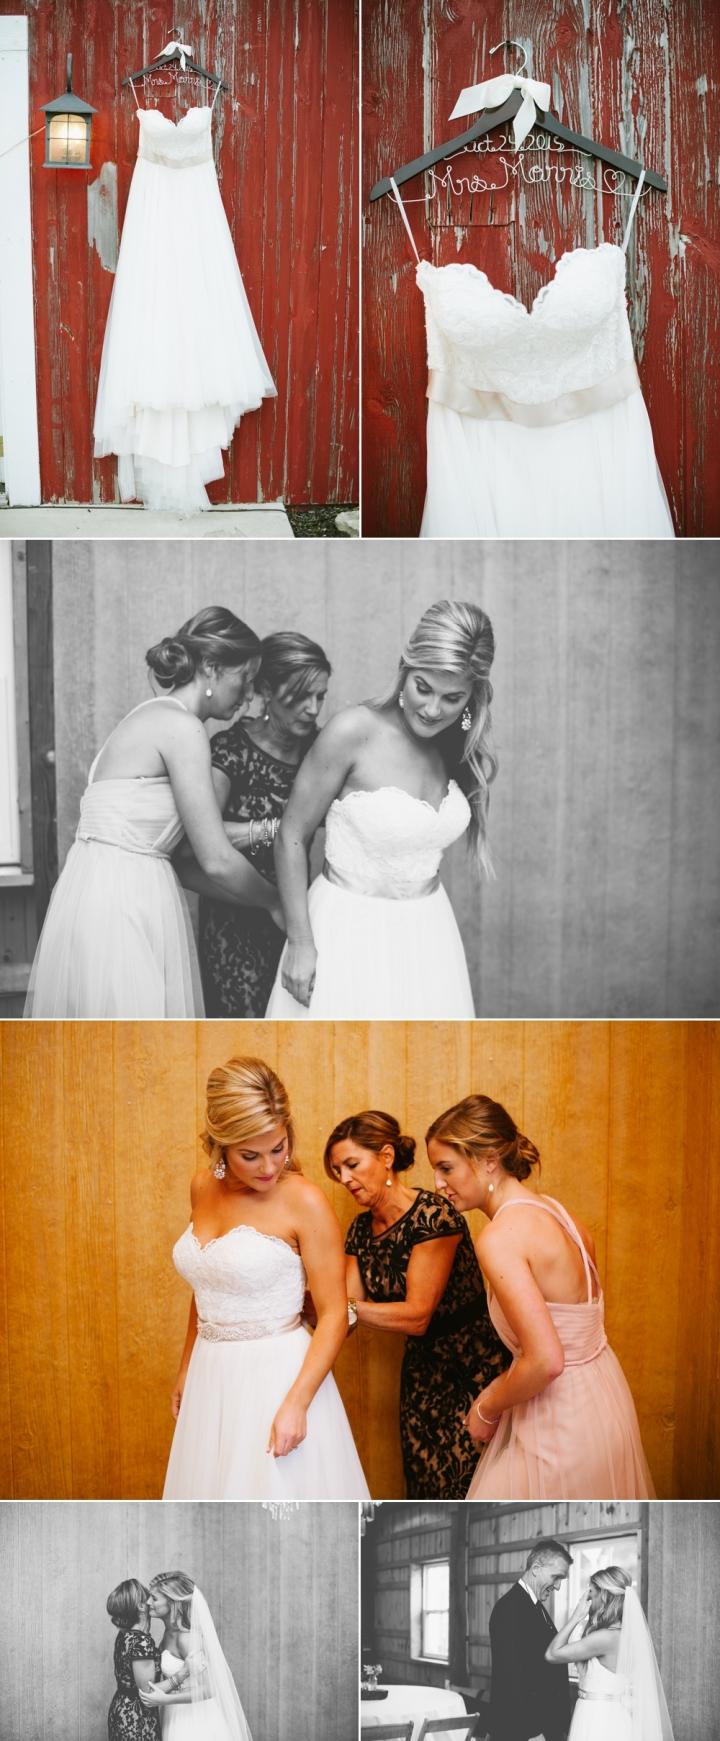 Madison & Ty Wedding Blog Post 2